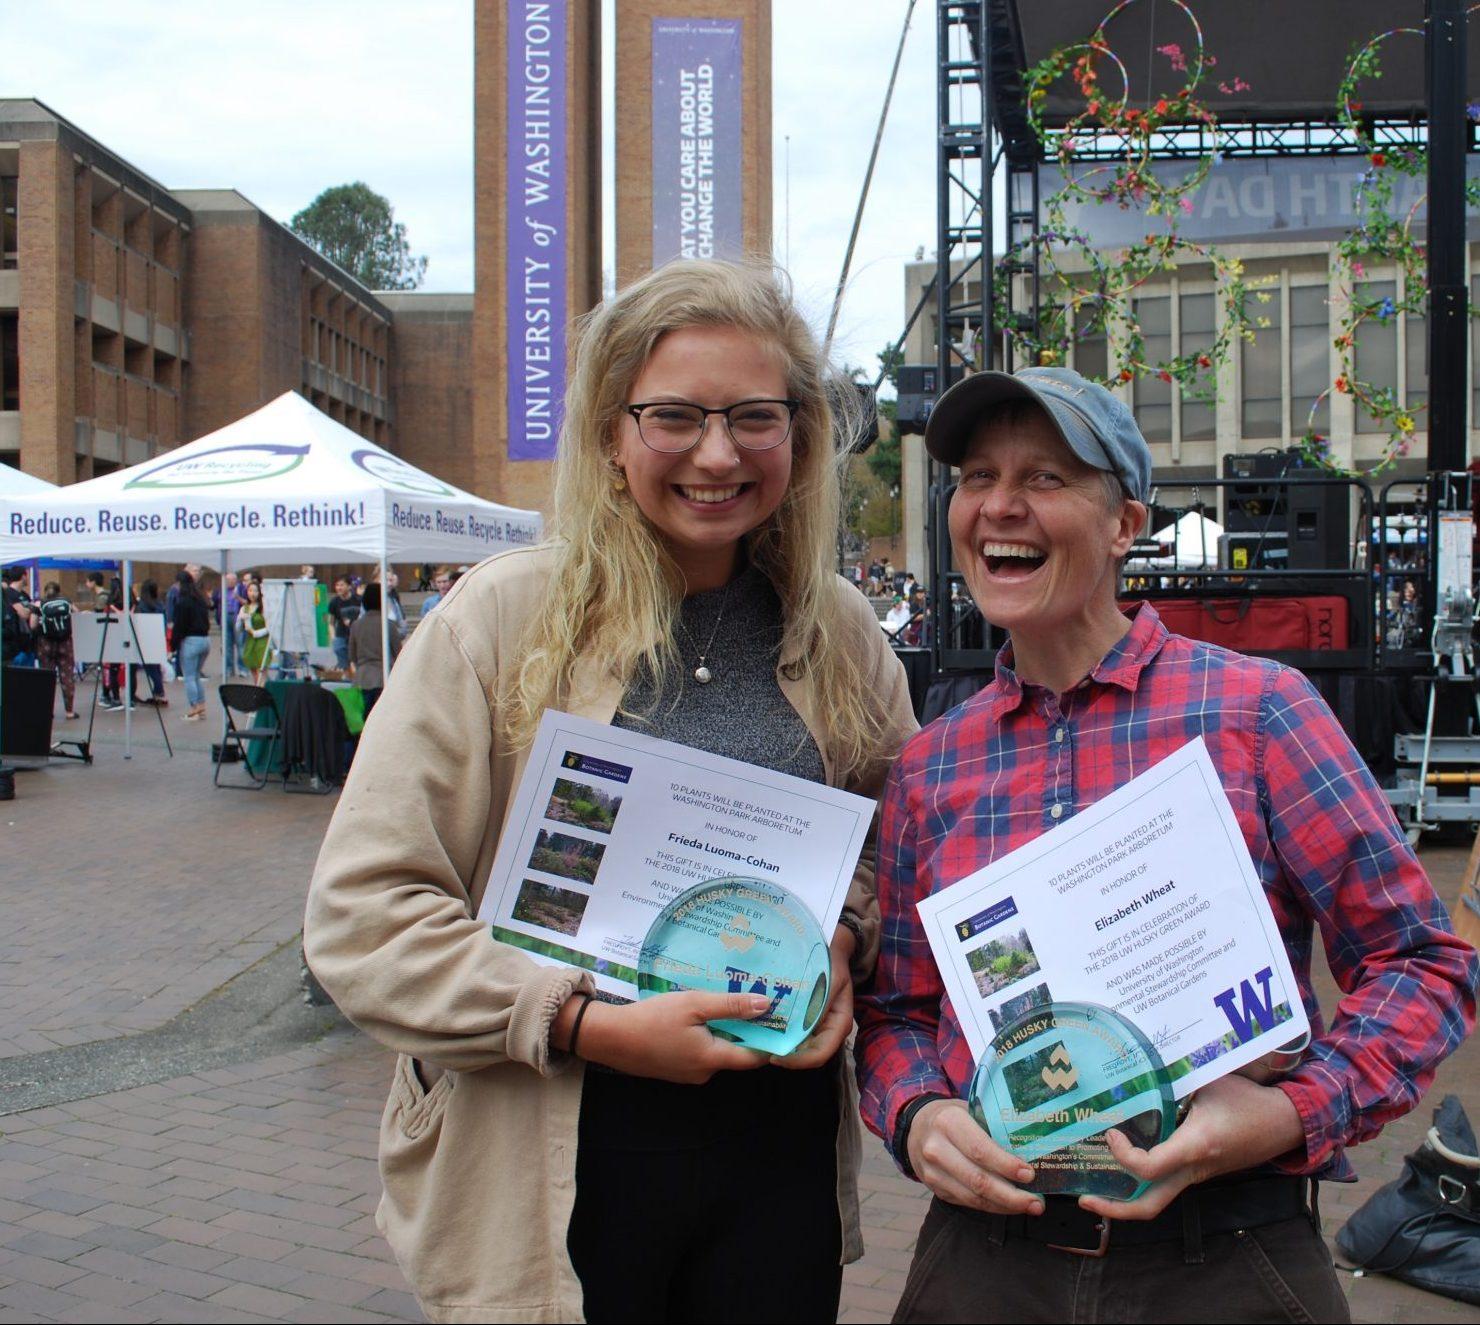 2018 Husky Green Award winners Frieda Cohan and Elizabeth Wheat